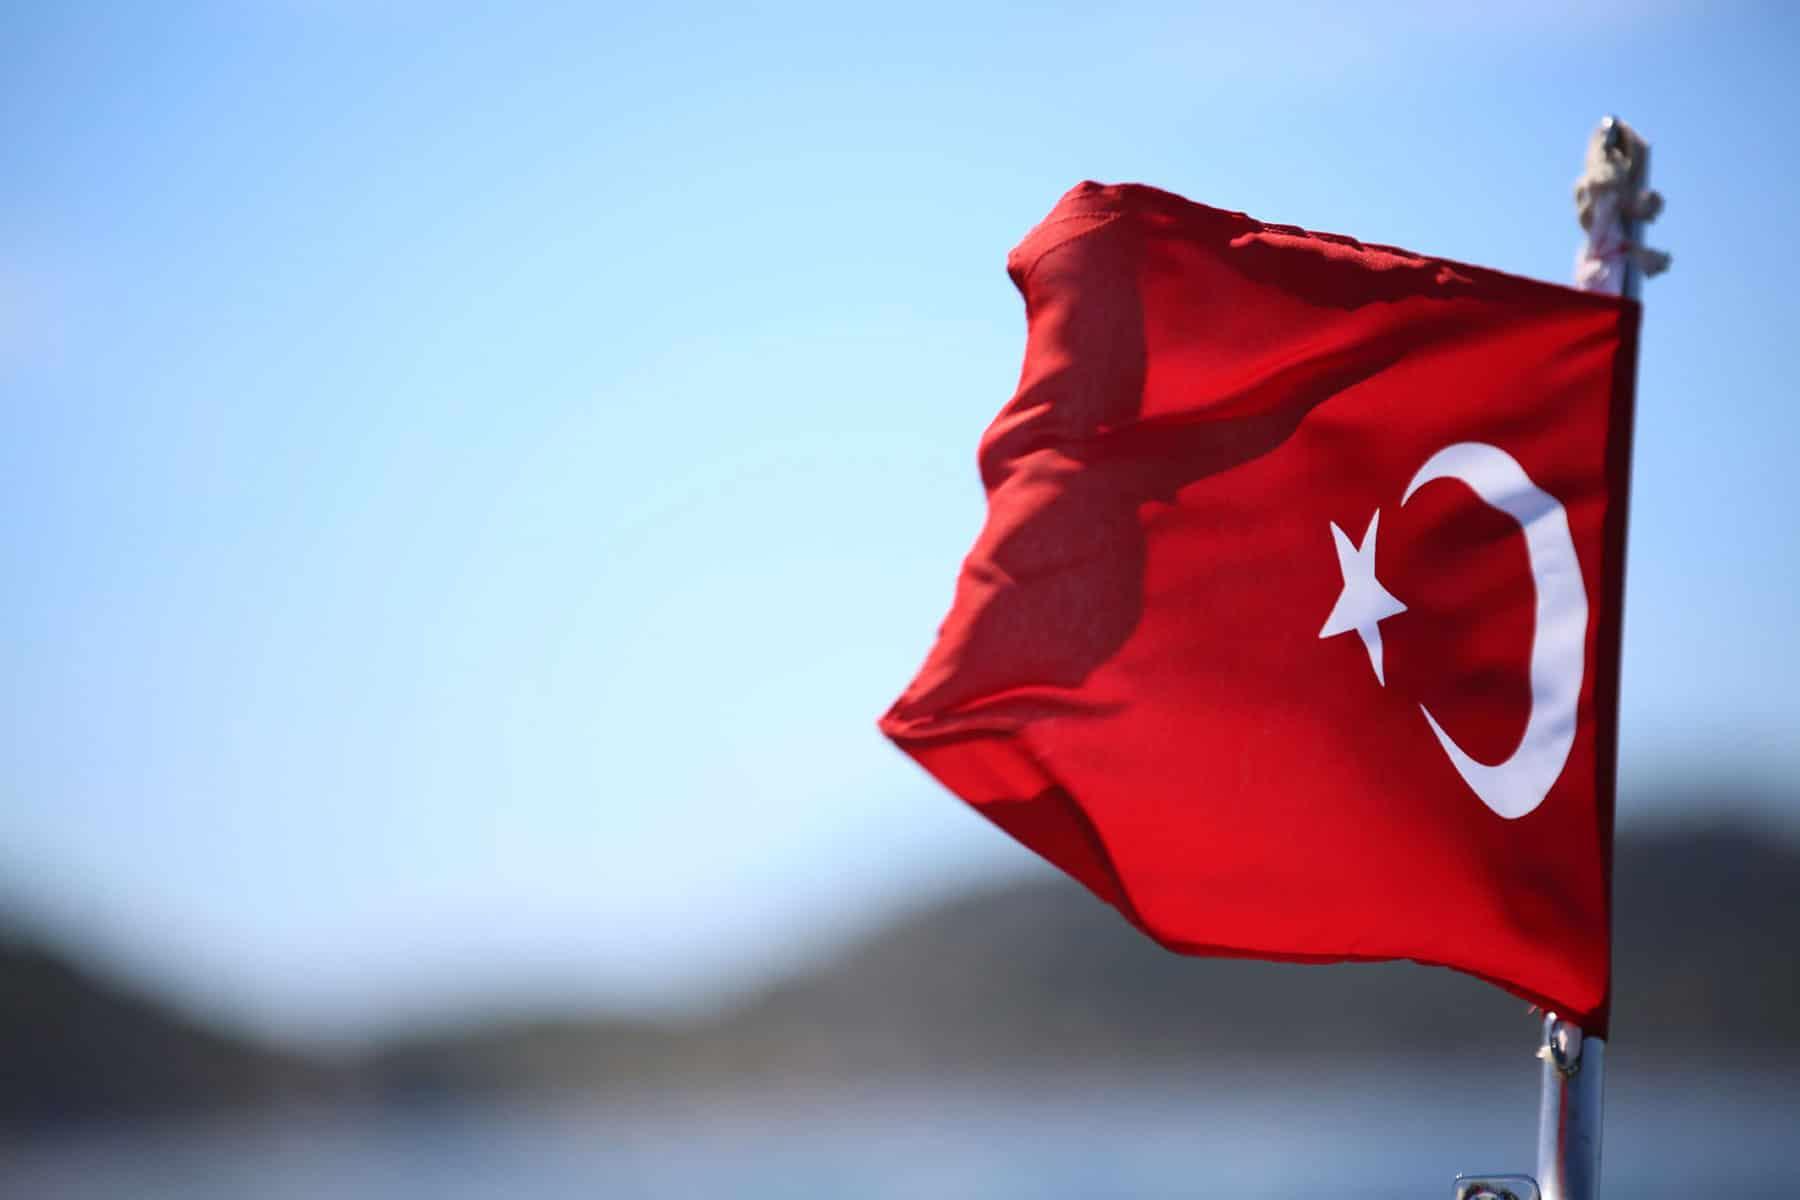 Pirates release fifteen Turkish sailors